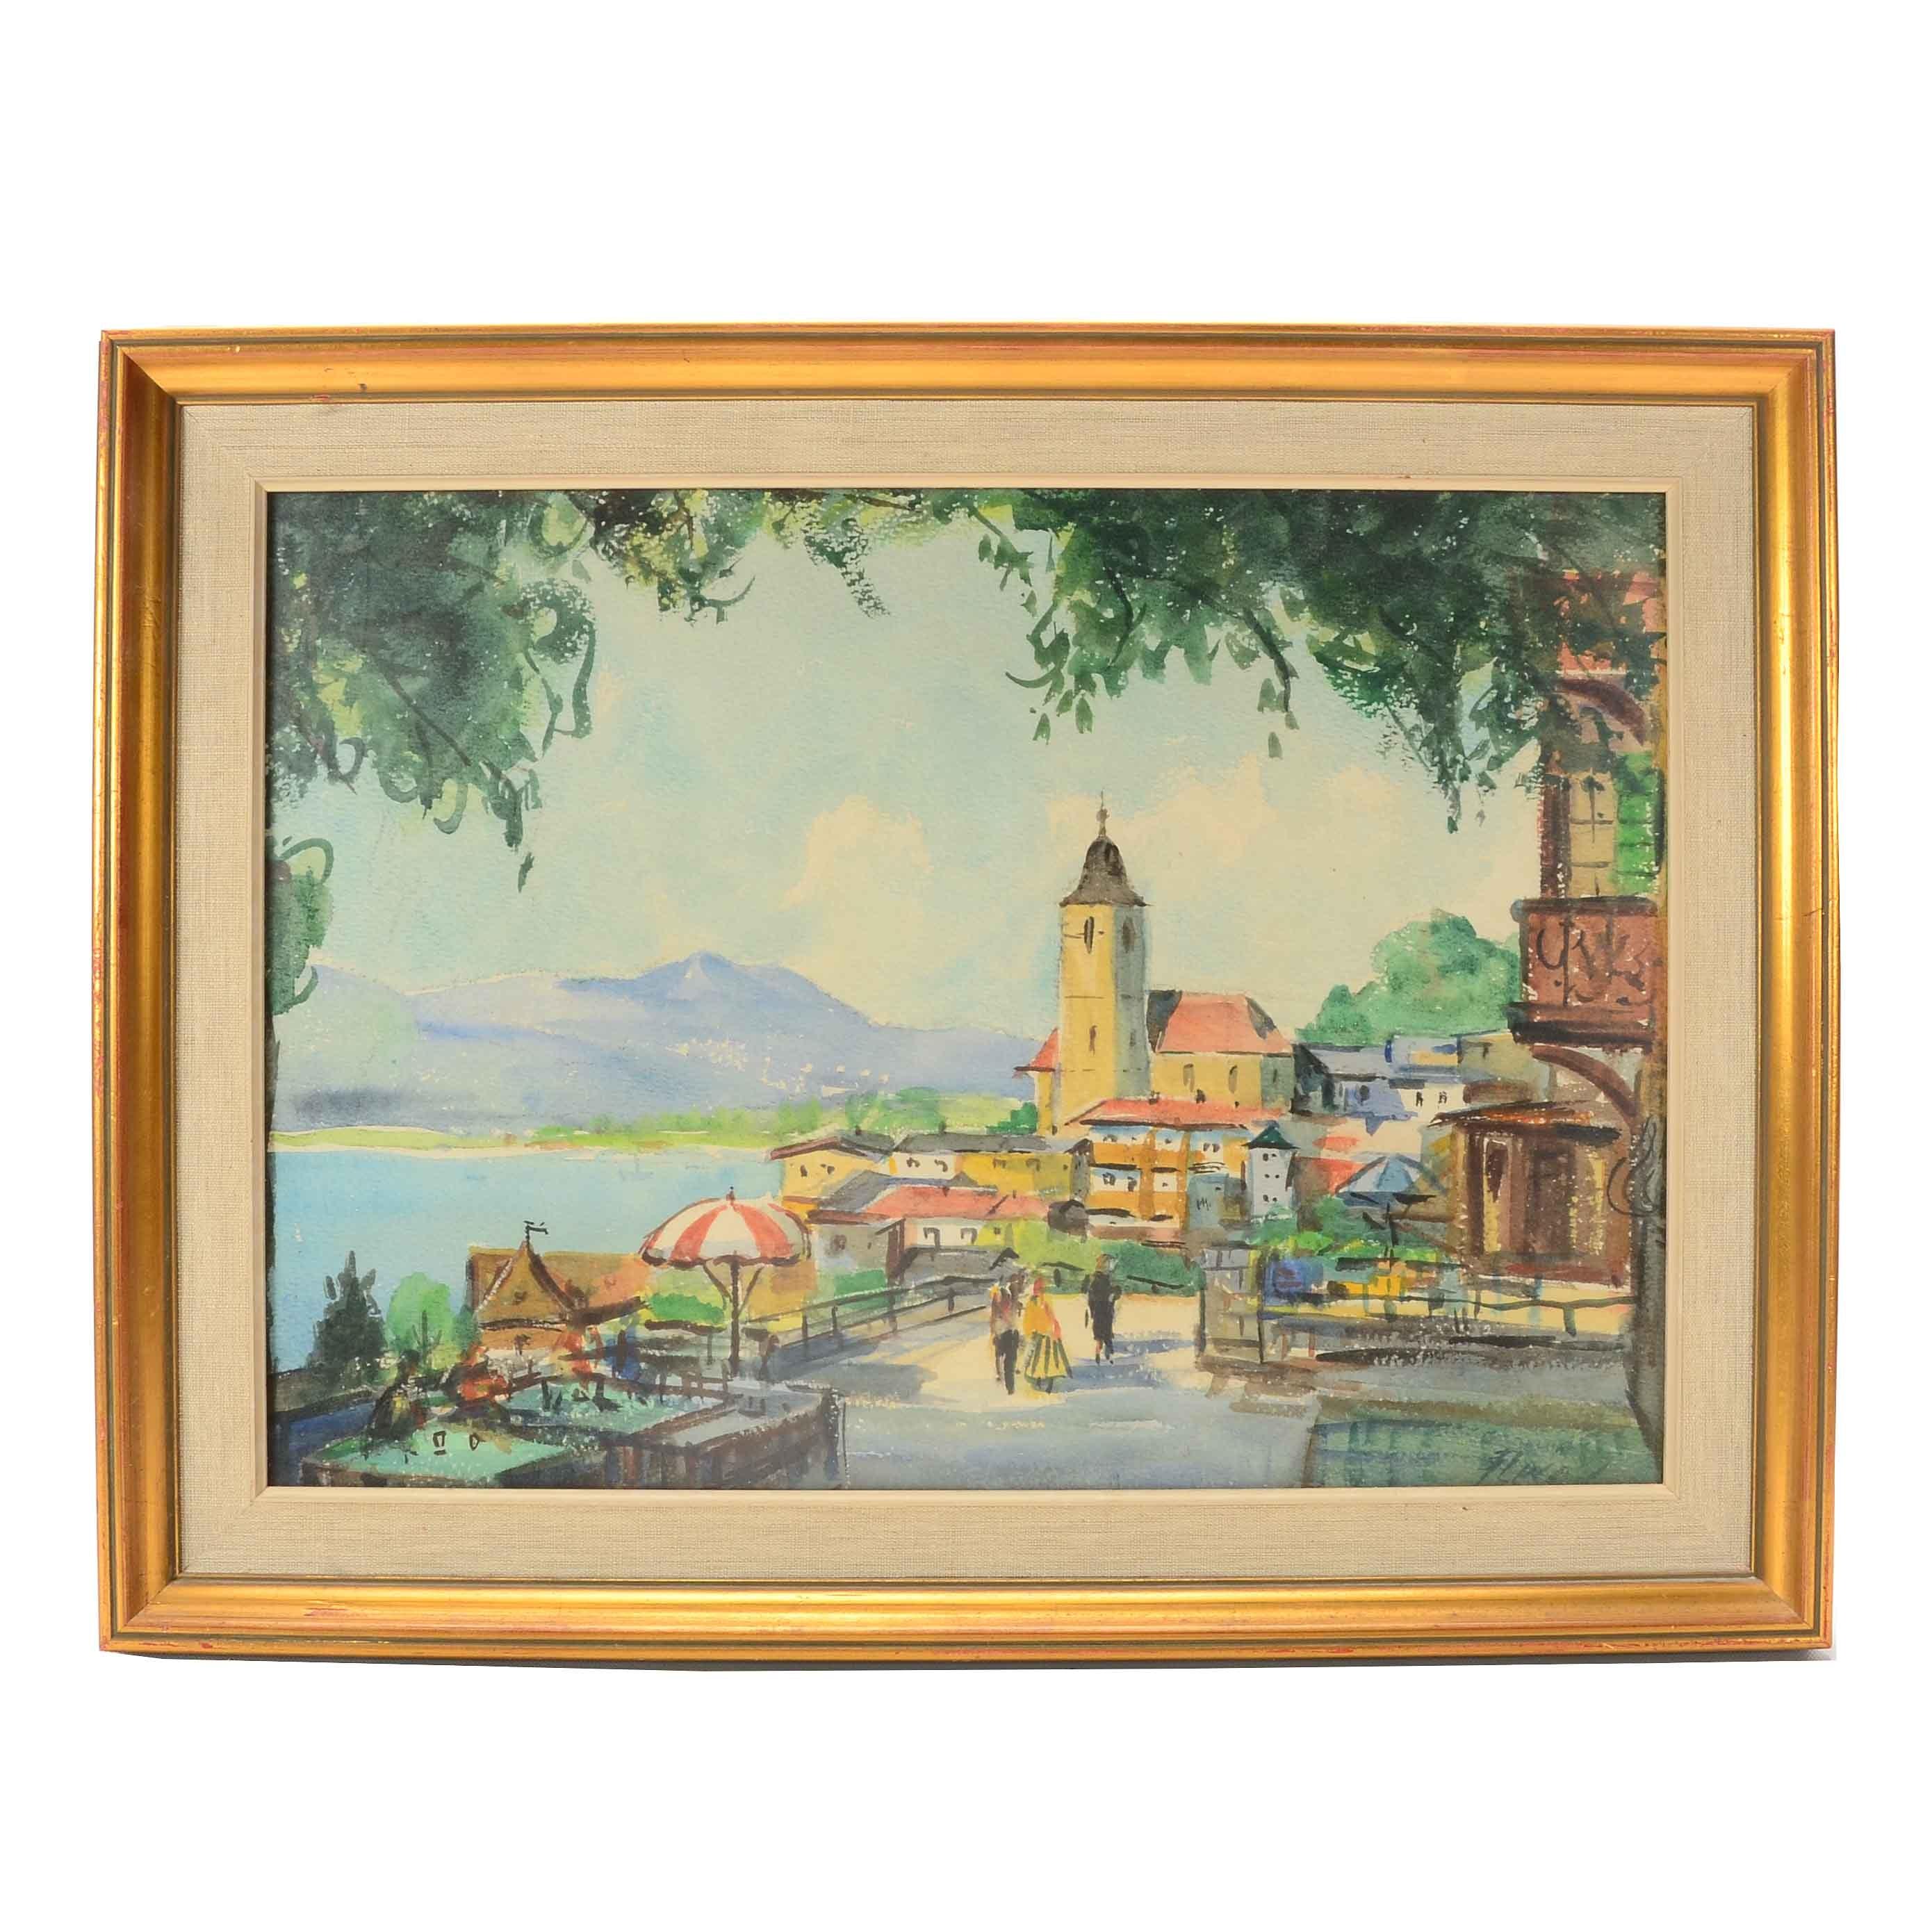 Original Watercolor on Paper Coastal Scene